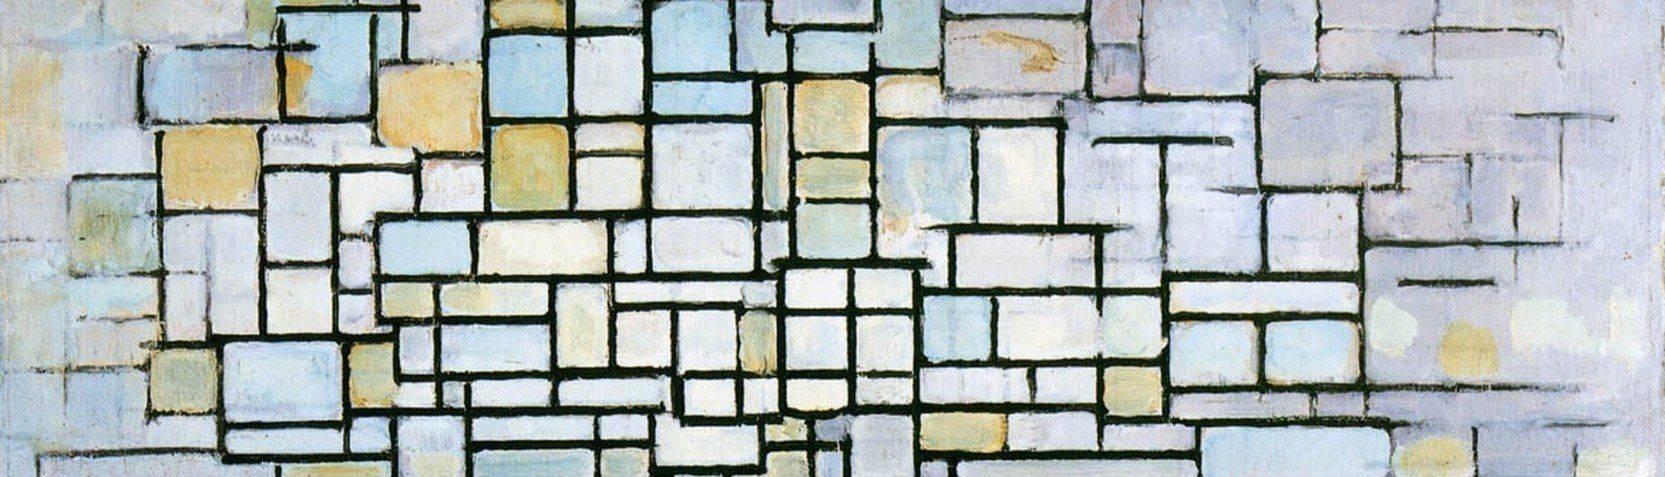 Artists A-Z - Piet Mondrian